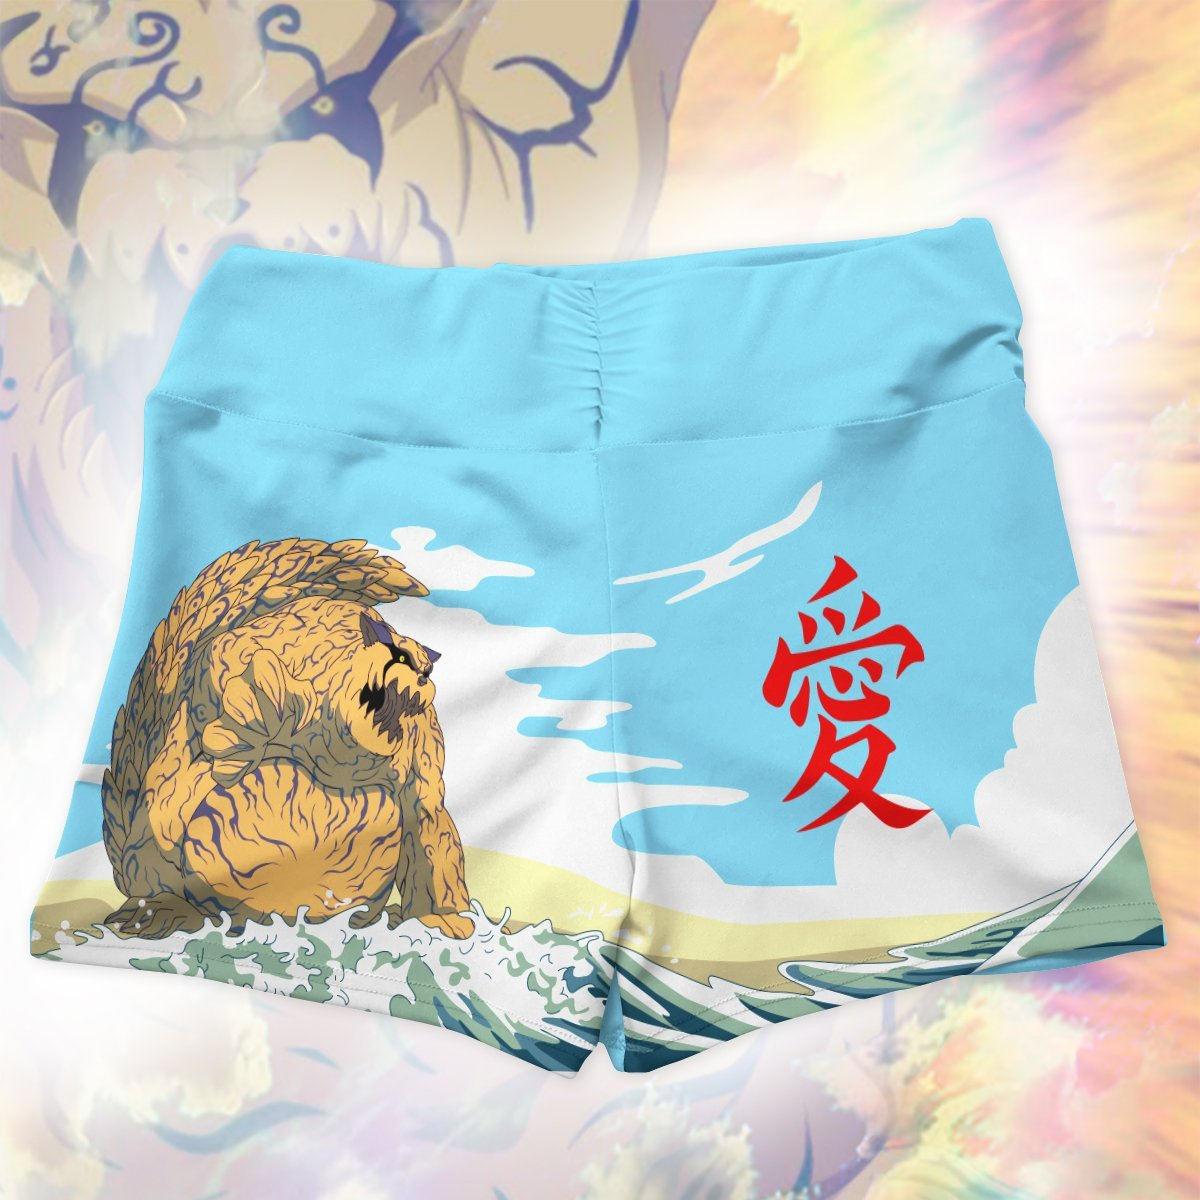 gaara summer active wear set 959590 - Anime Swimsuits